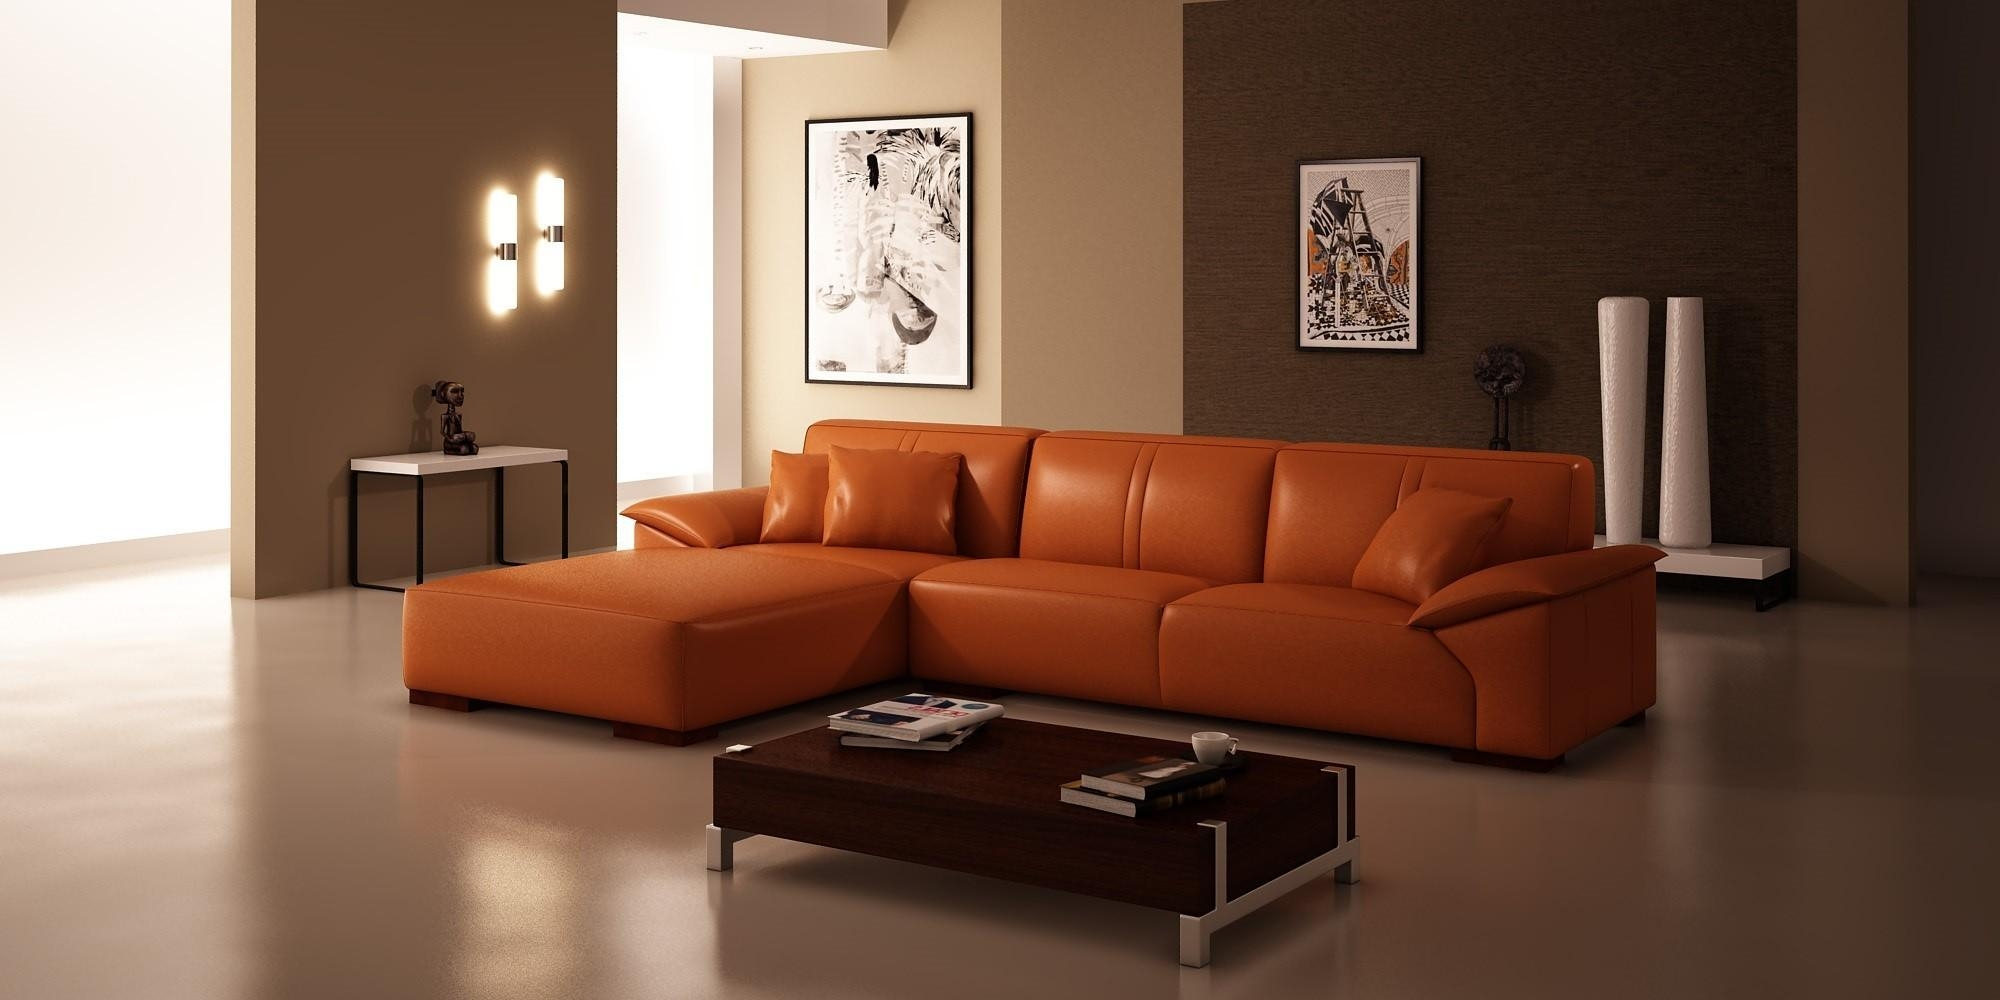 Orange Leather Sofa And Loveseat | Tehranmix Decoration In Burnt Orange Leather Sofas (Image 7 of 20)